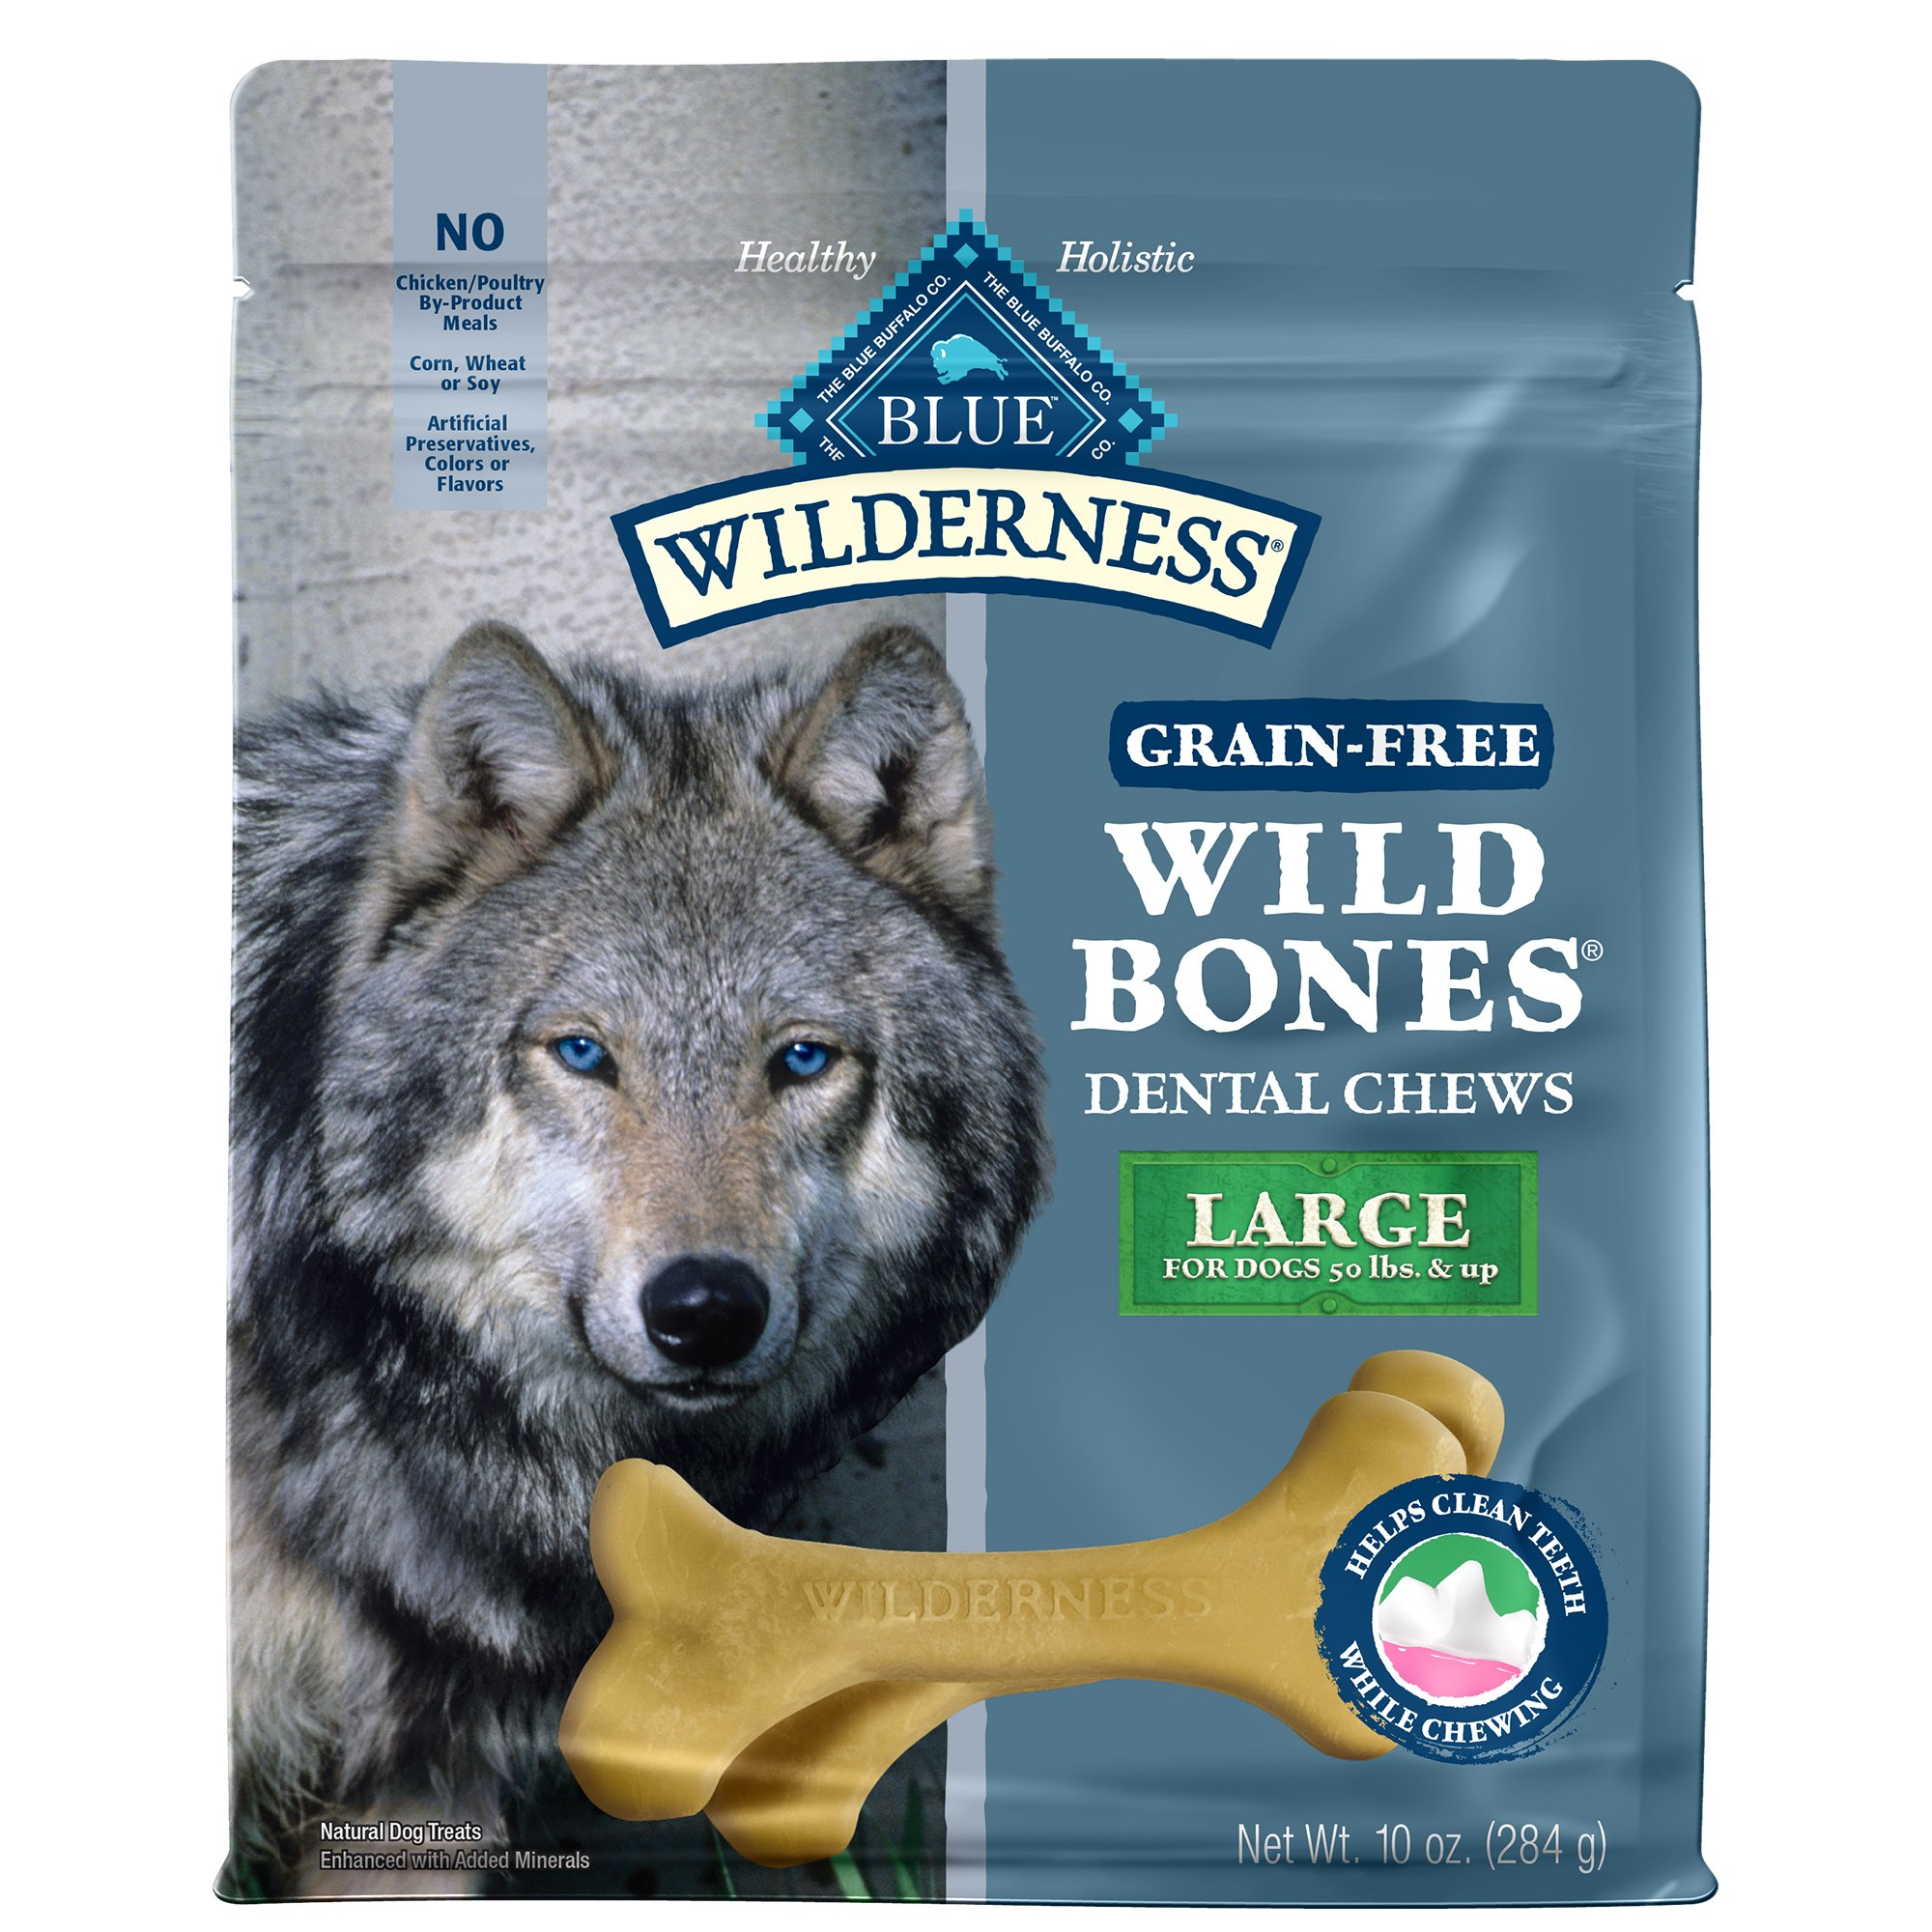 Blue Buffalo Wilderness Wild Bones Dog Dental Chews